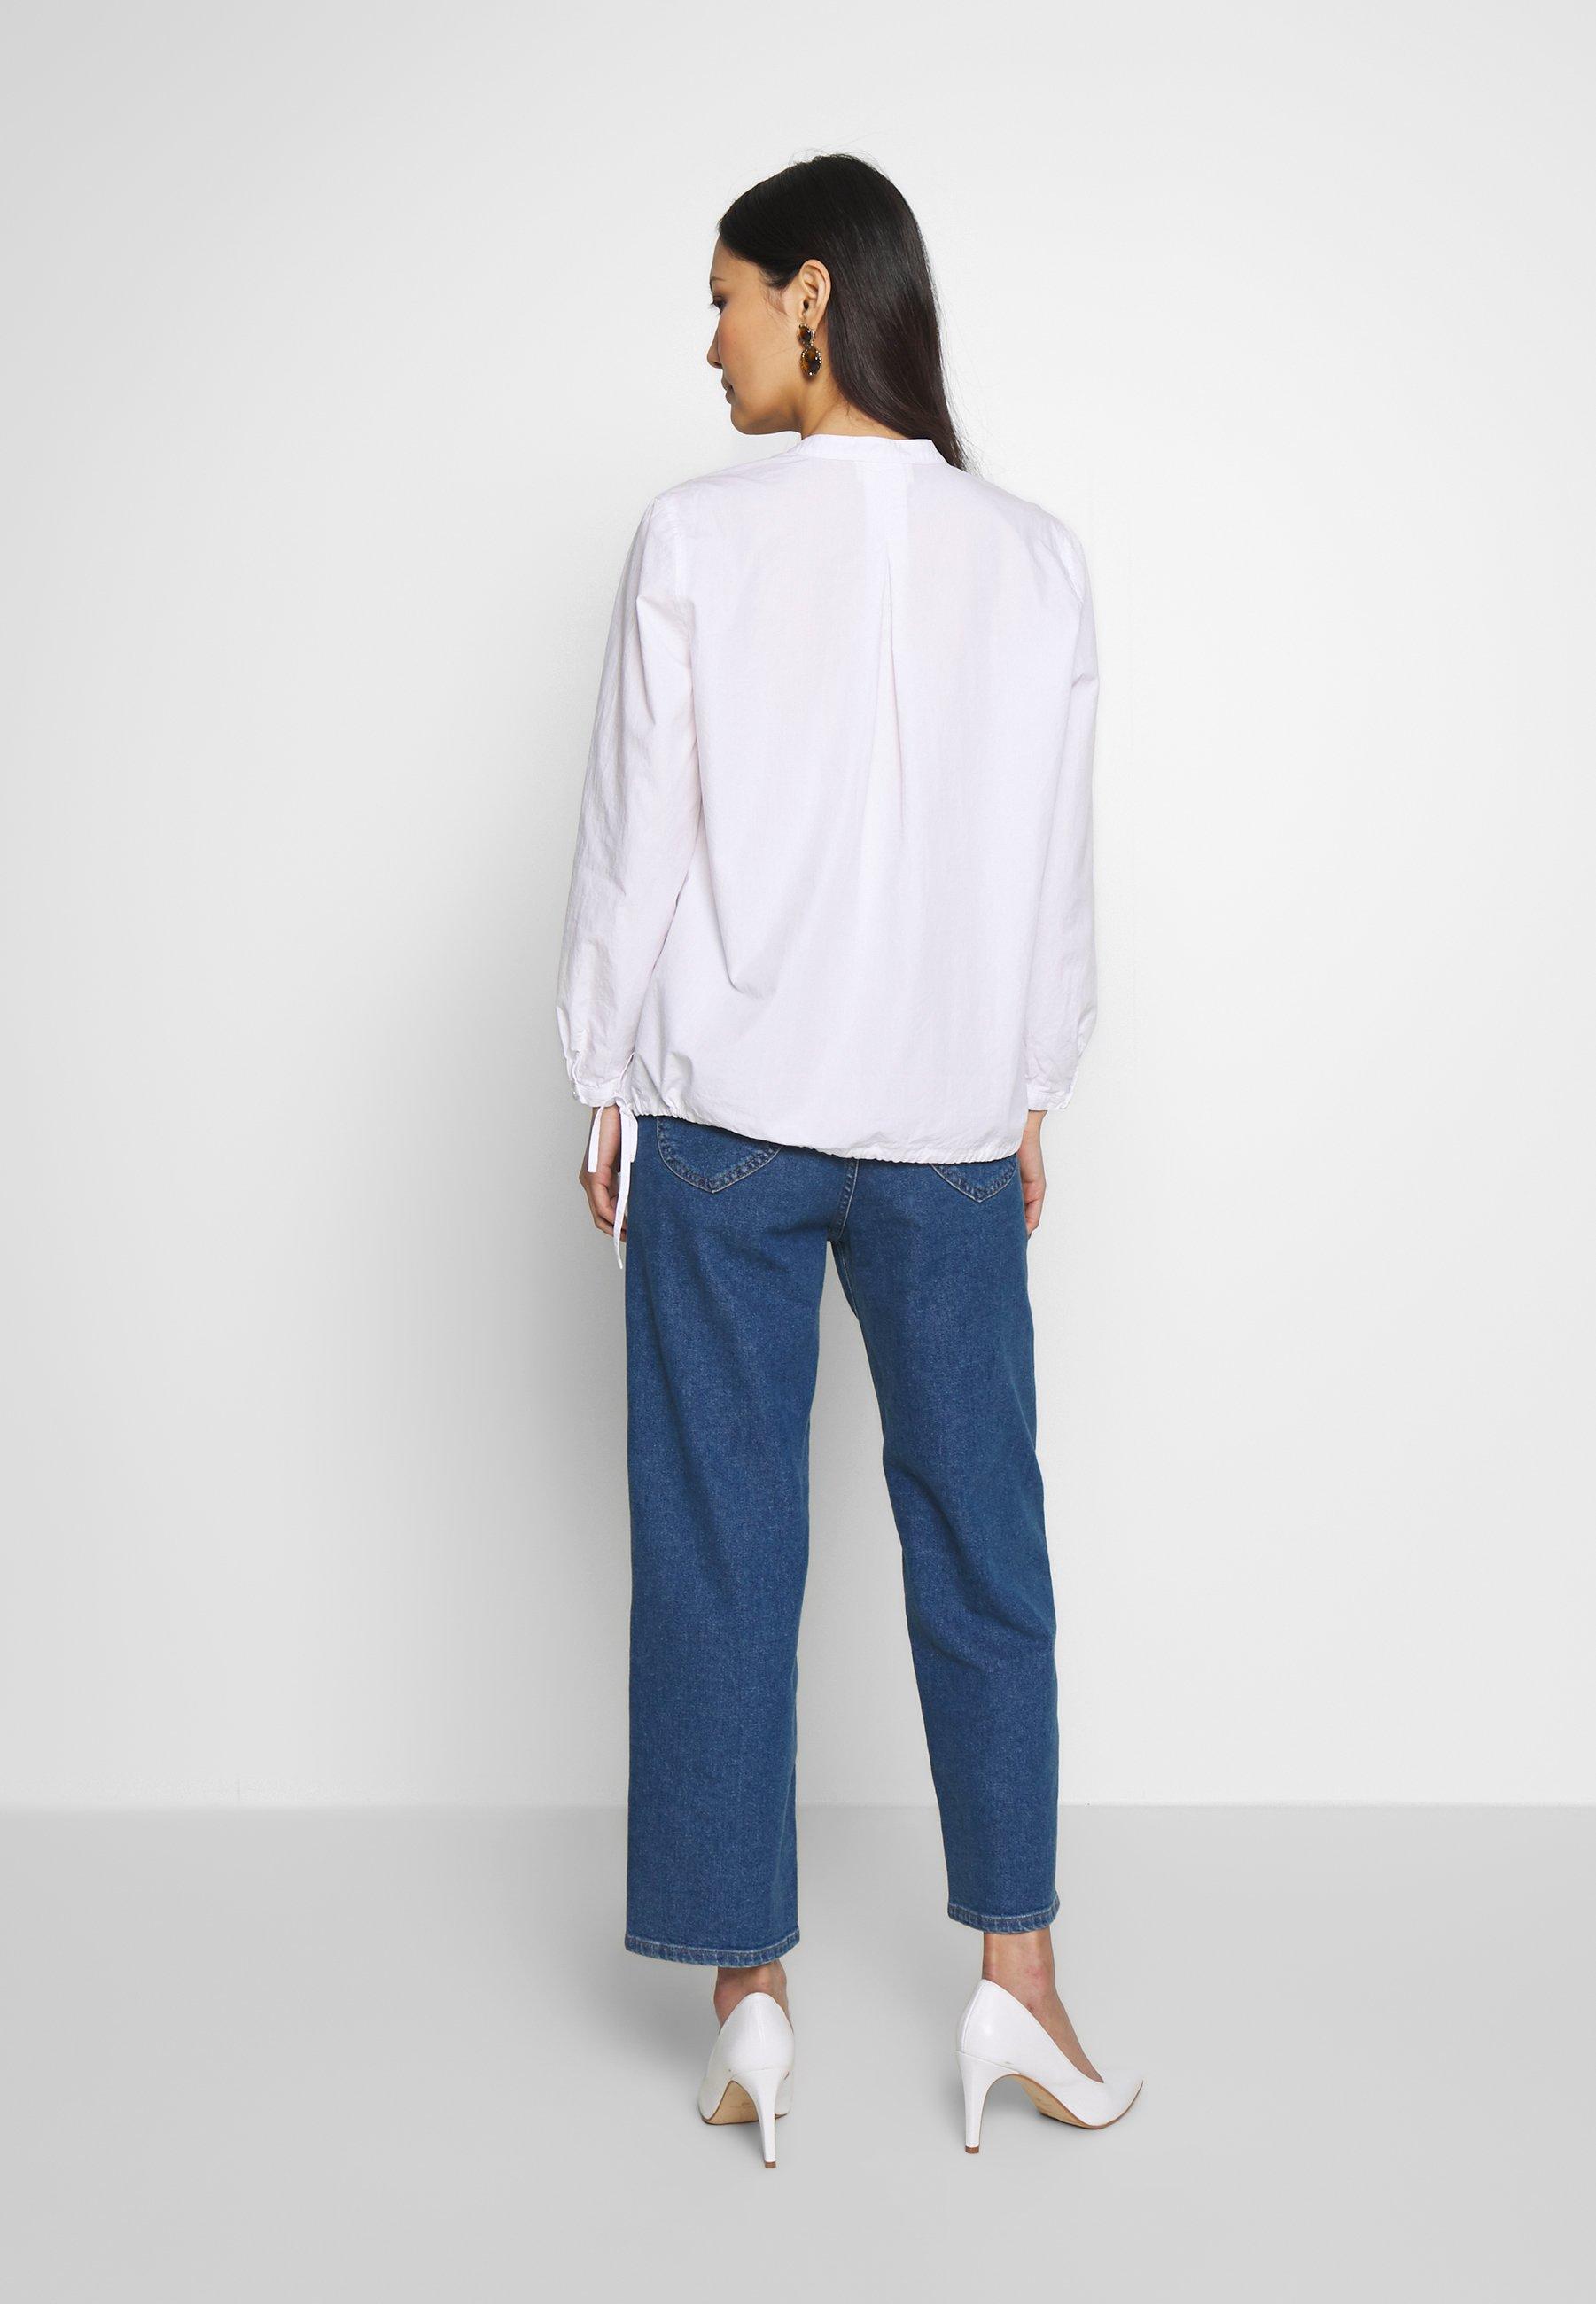 Cartoon Button-down blouse - bright white IWfp9